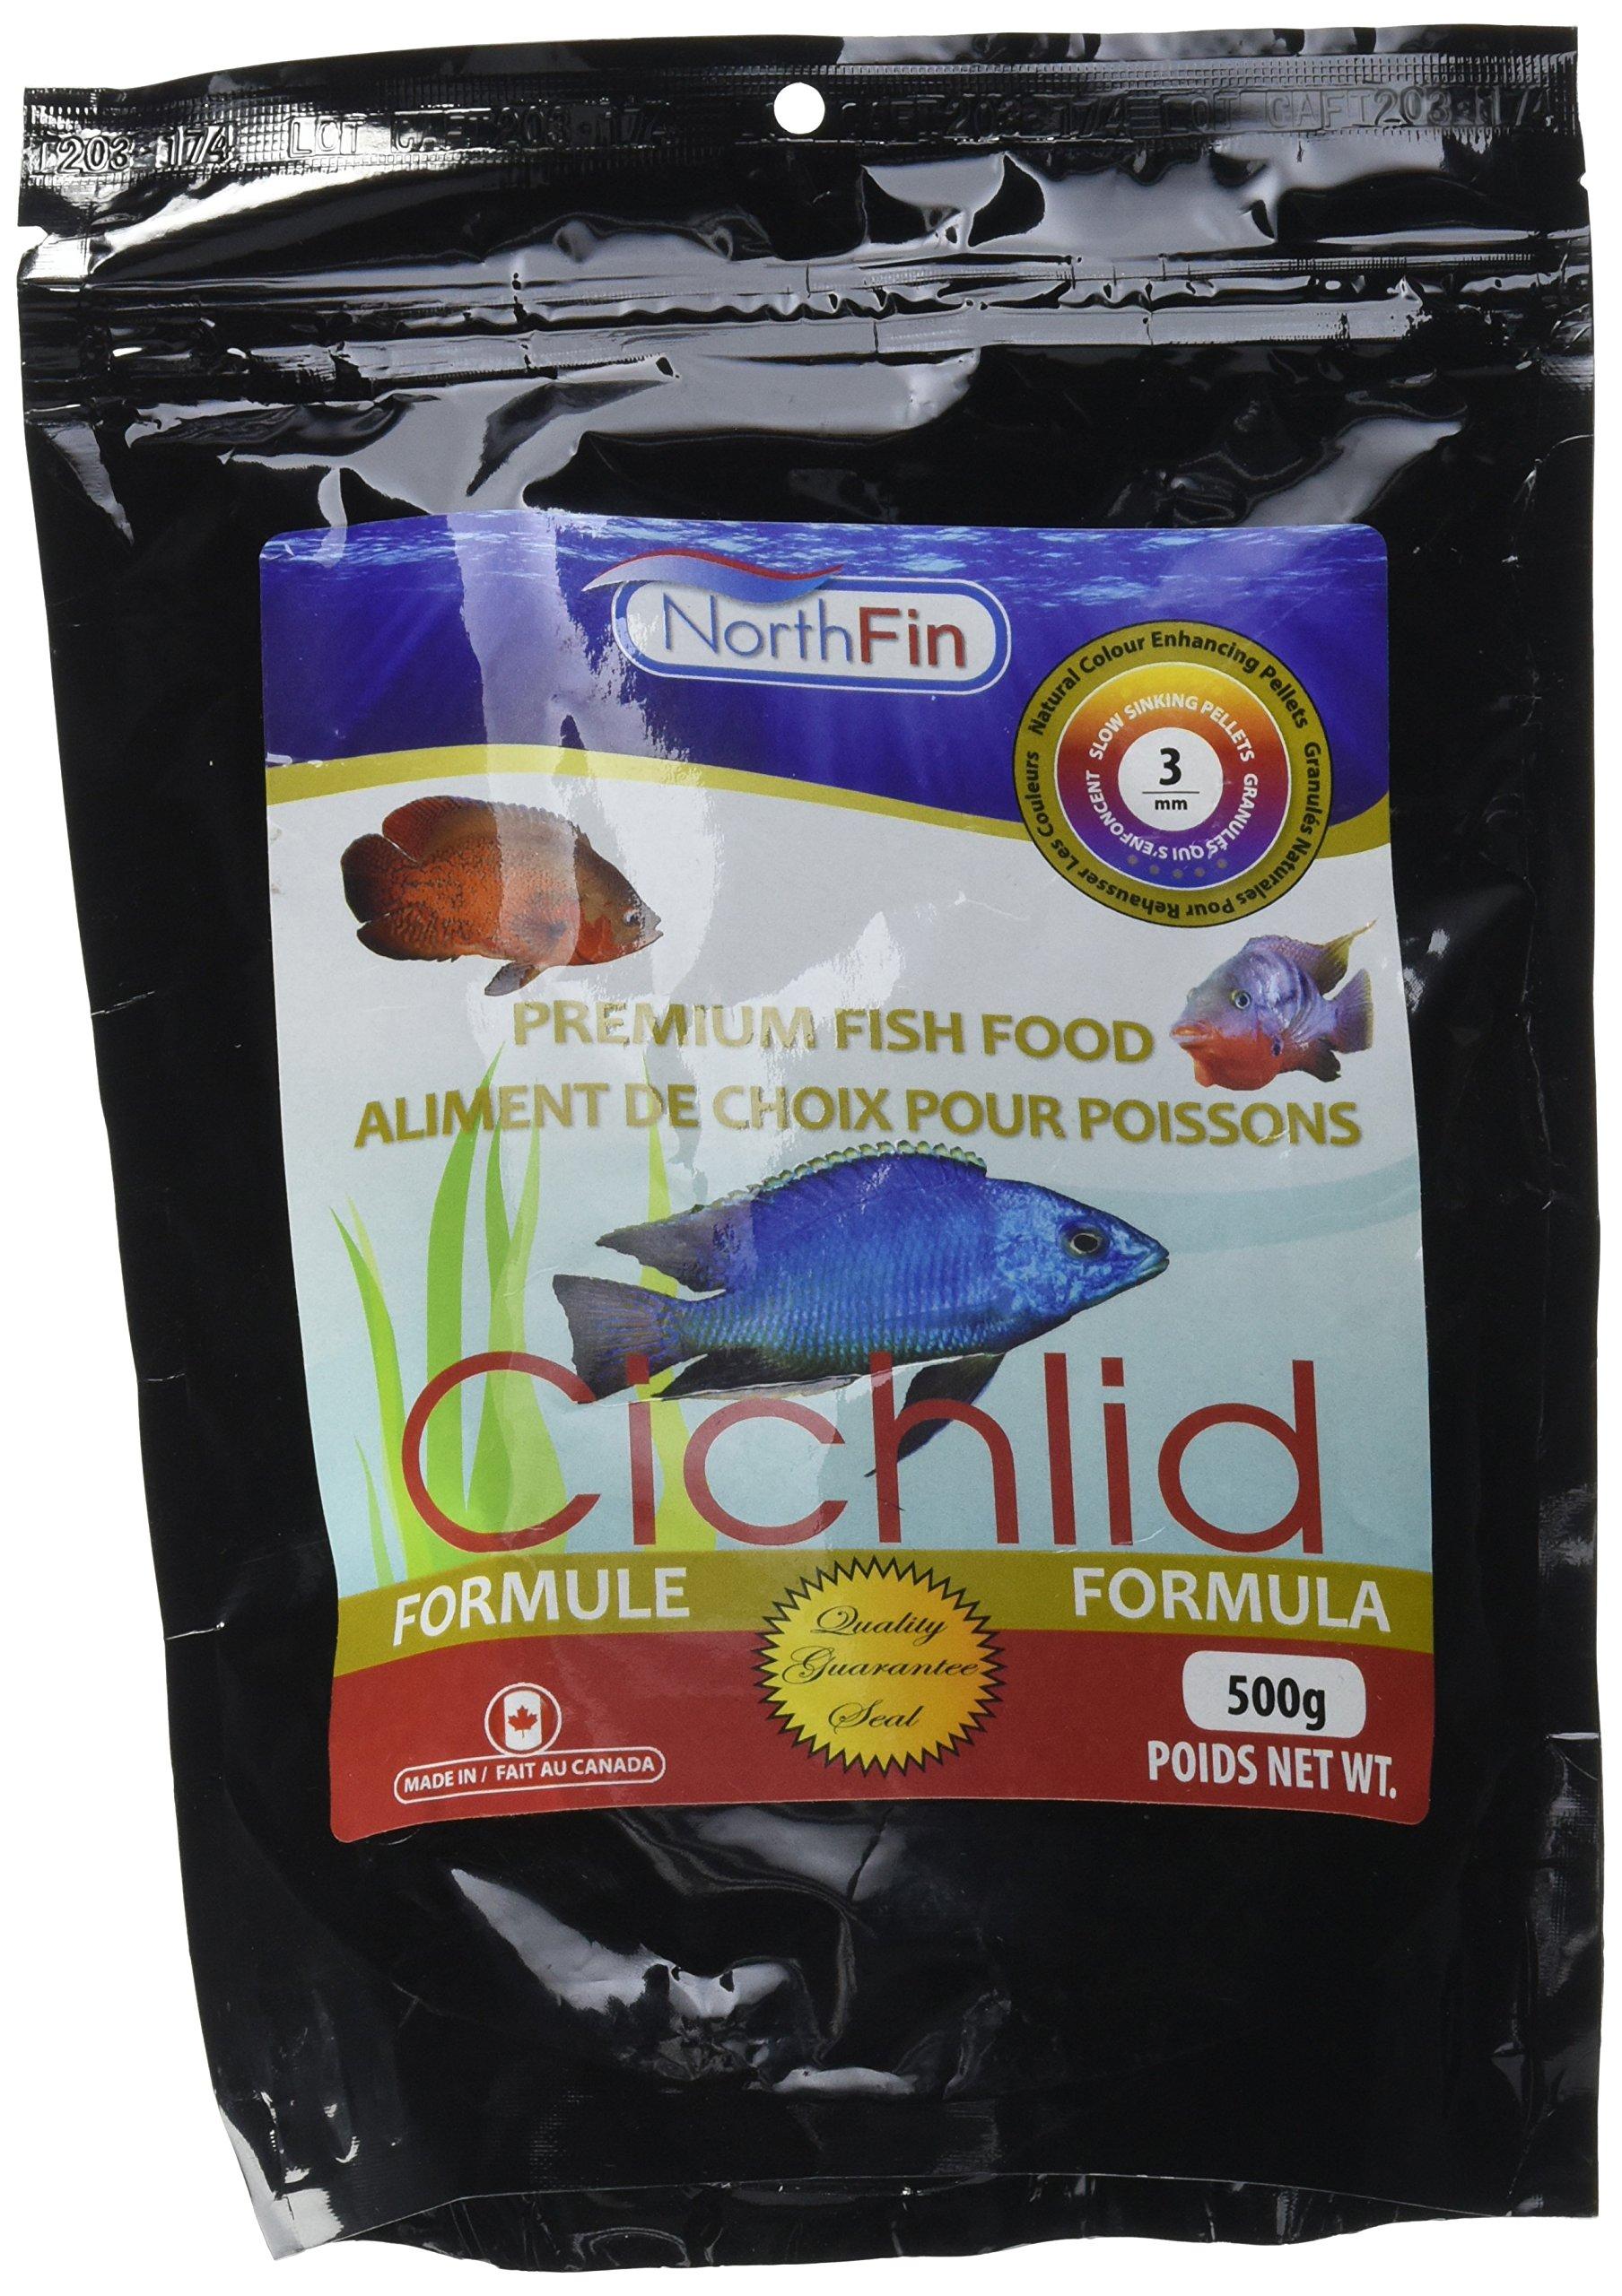 Northfin Fish Food, 3 mm Sinking Pellets, 500 g, Cichlid Formula by Northfin (Image #1)